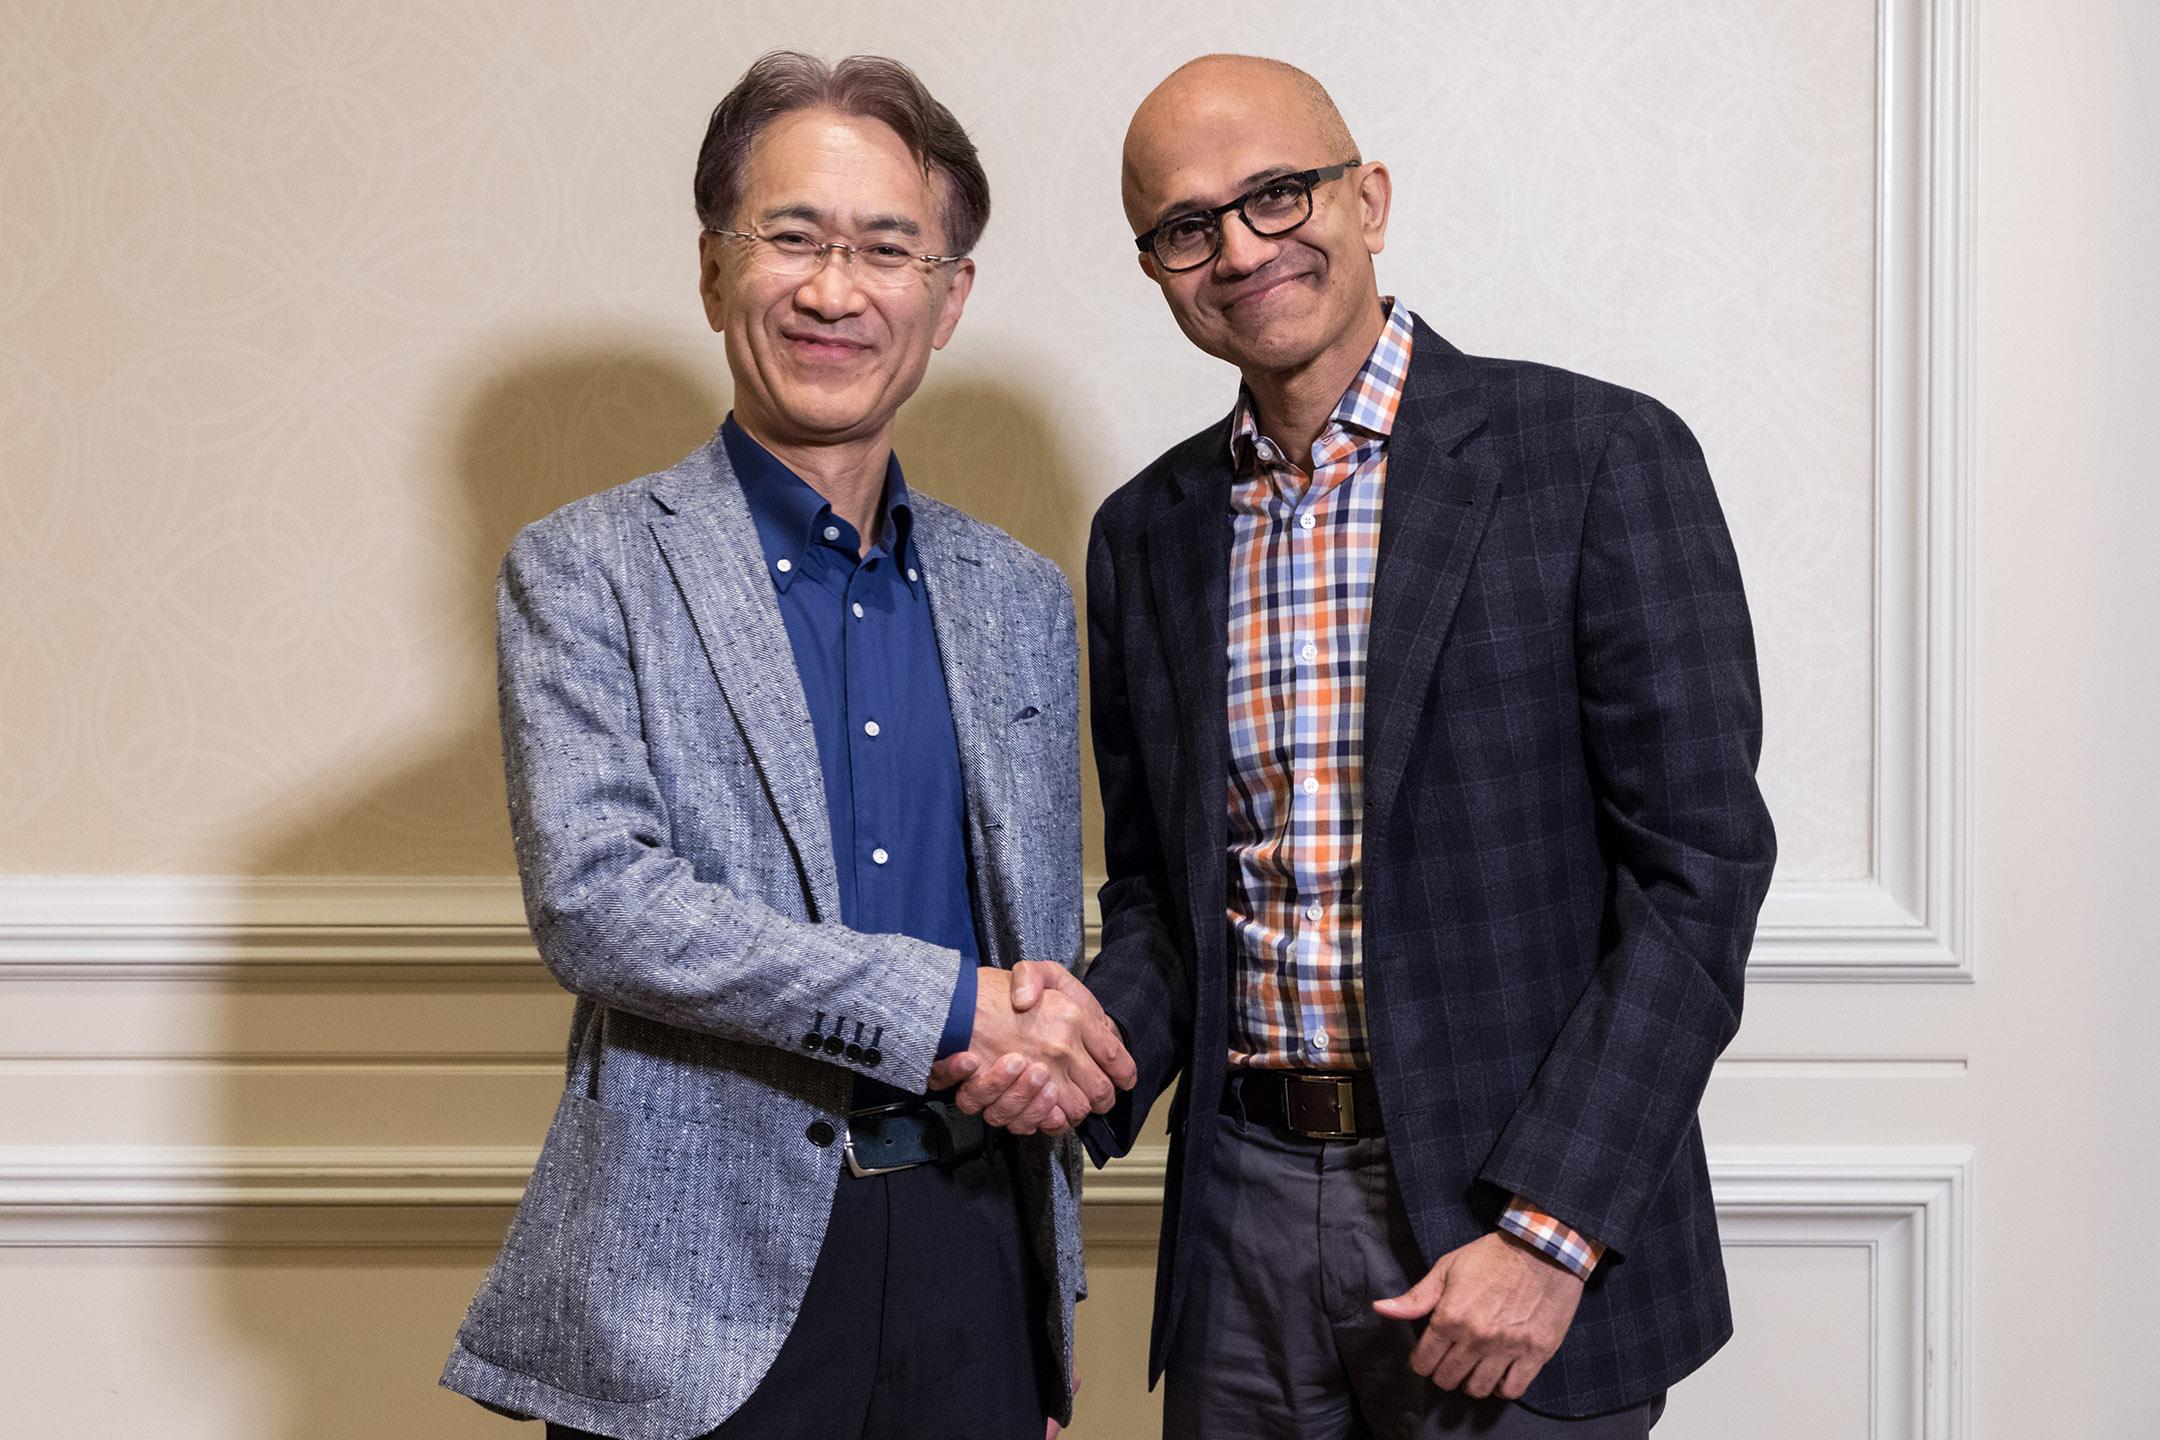 Chief executives Kenichiro Yoshida of Sony and Satya Nadella of Microsoft